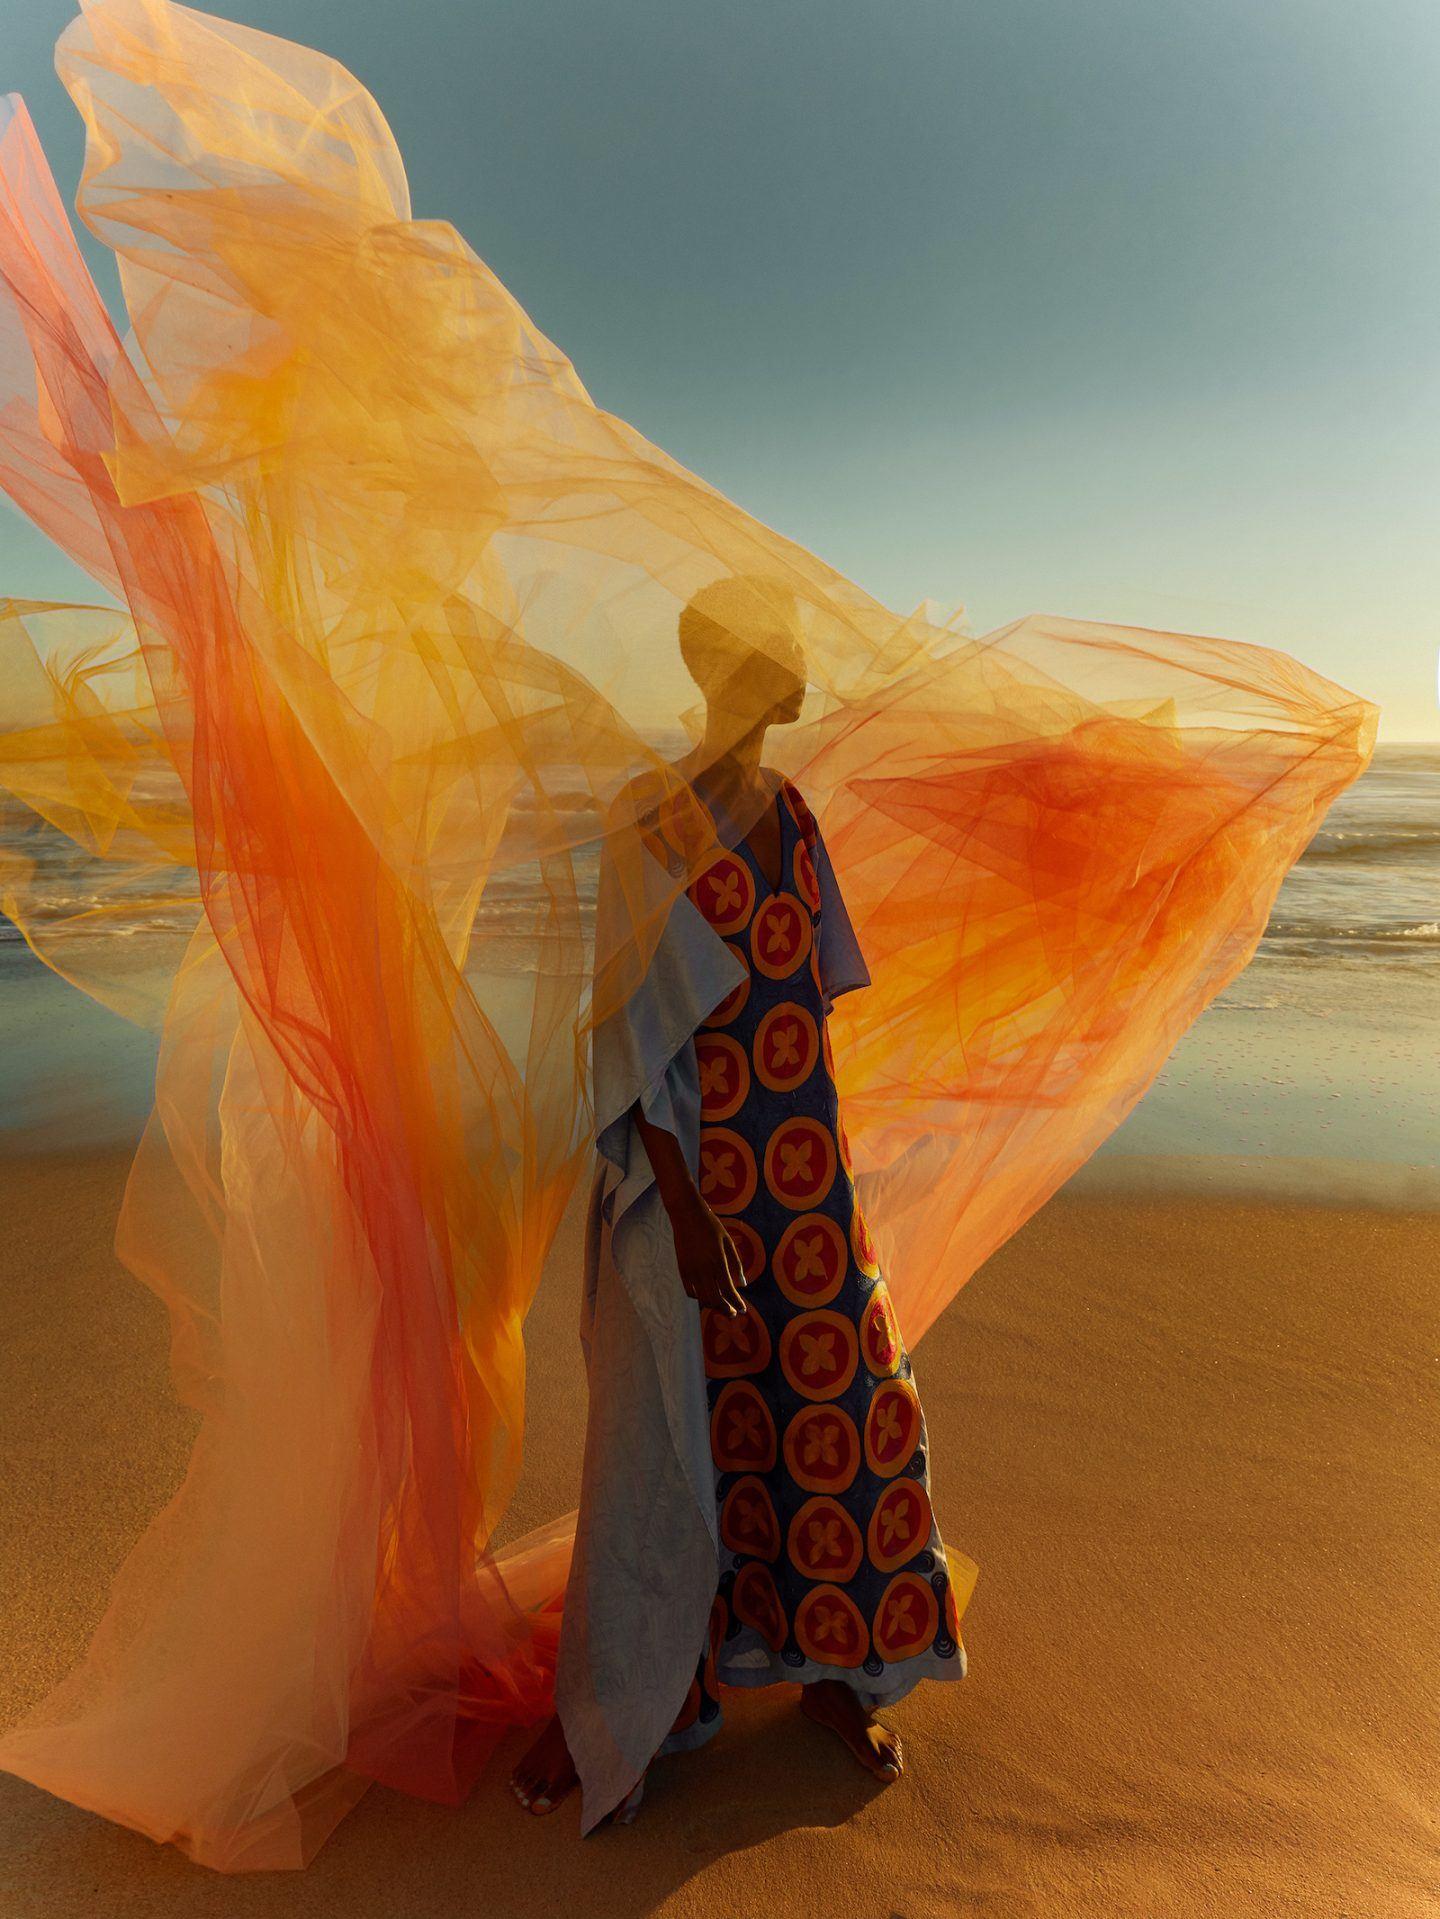 IGNANT-Photography-Nadia-von-Scotti-08